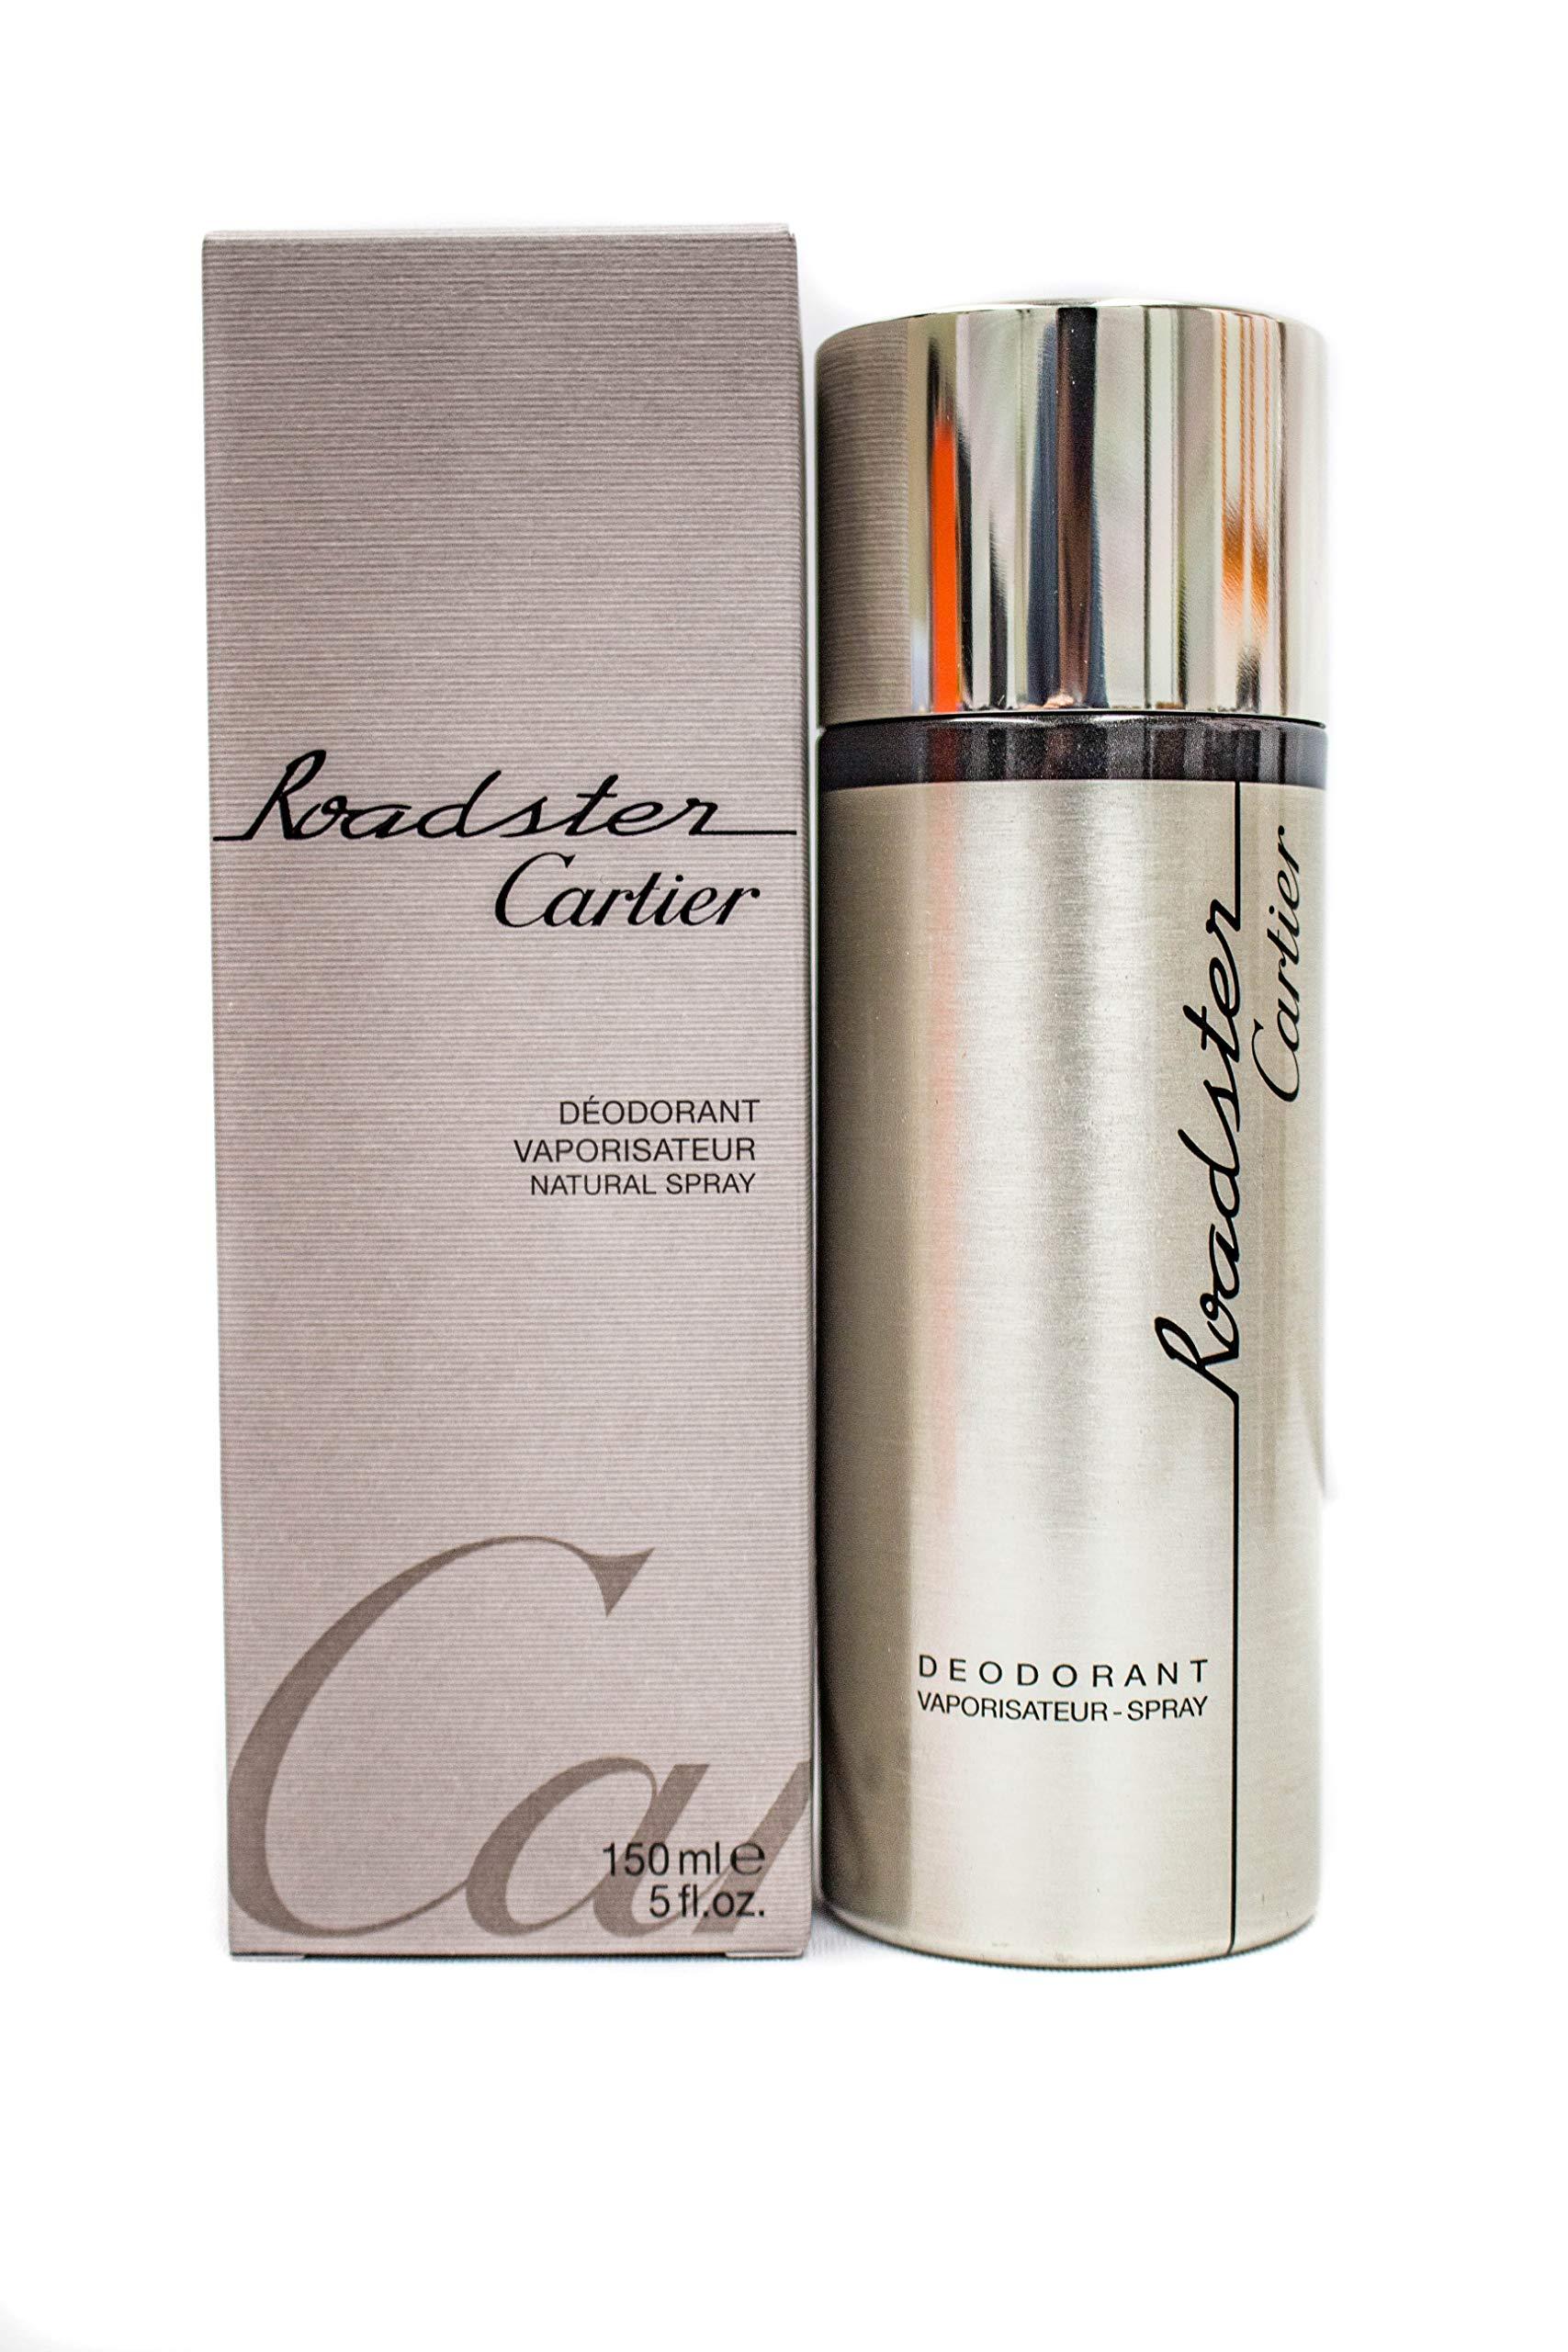 Cartier Roadster Deodorant Spray 5.0 Fl. Oz / 150 ML